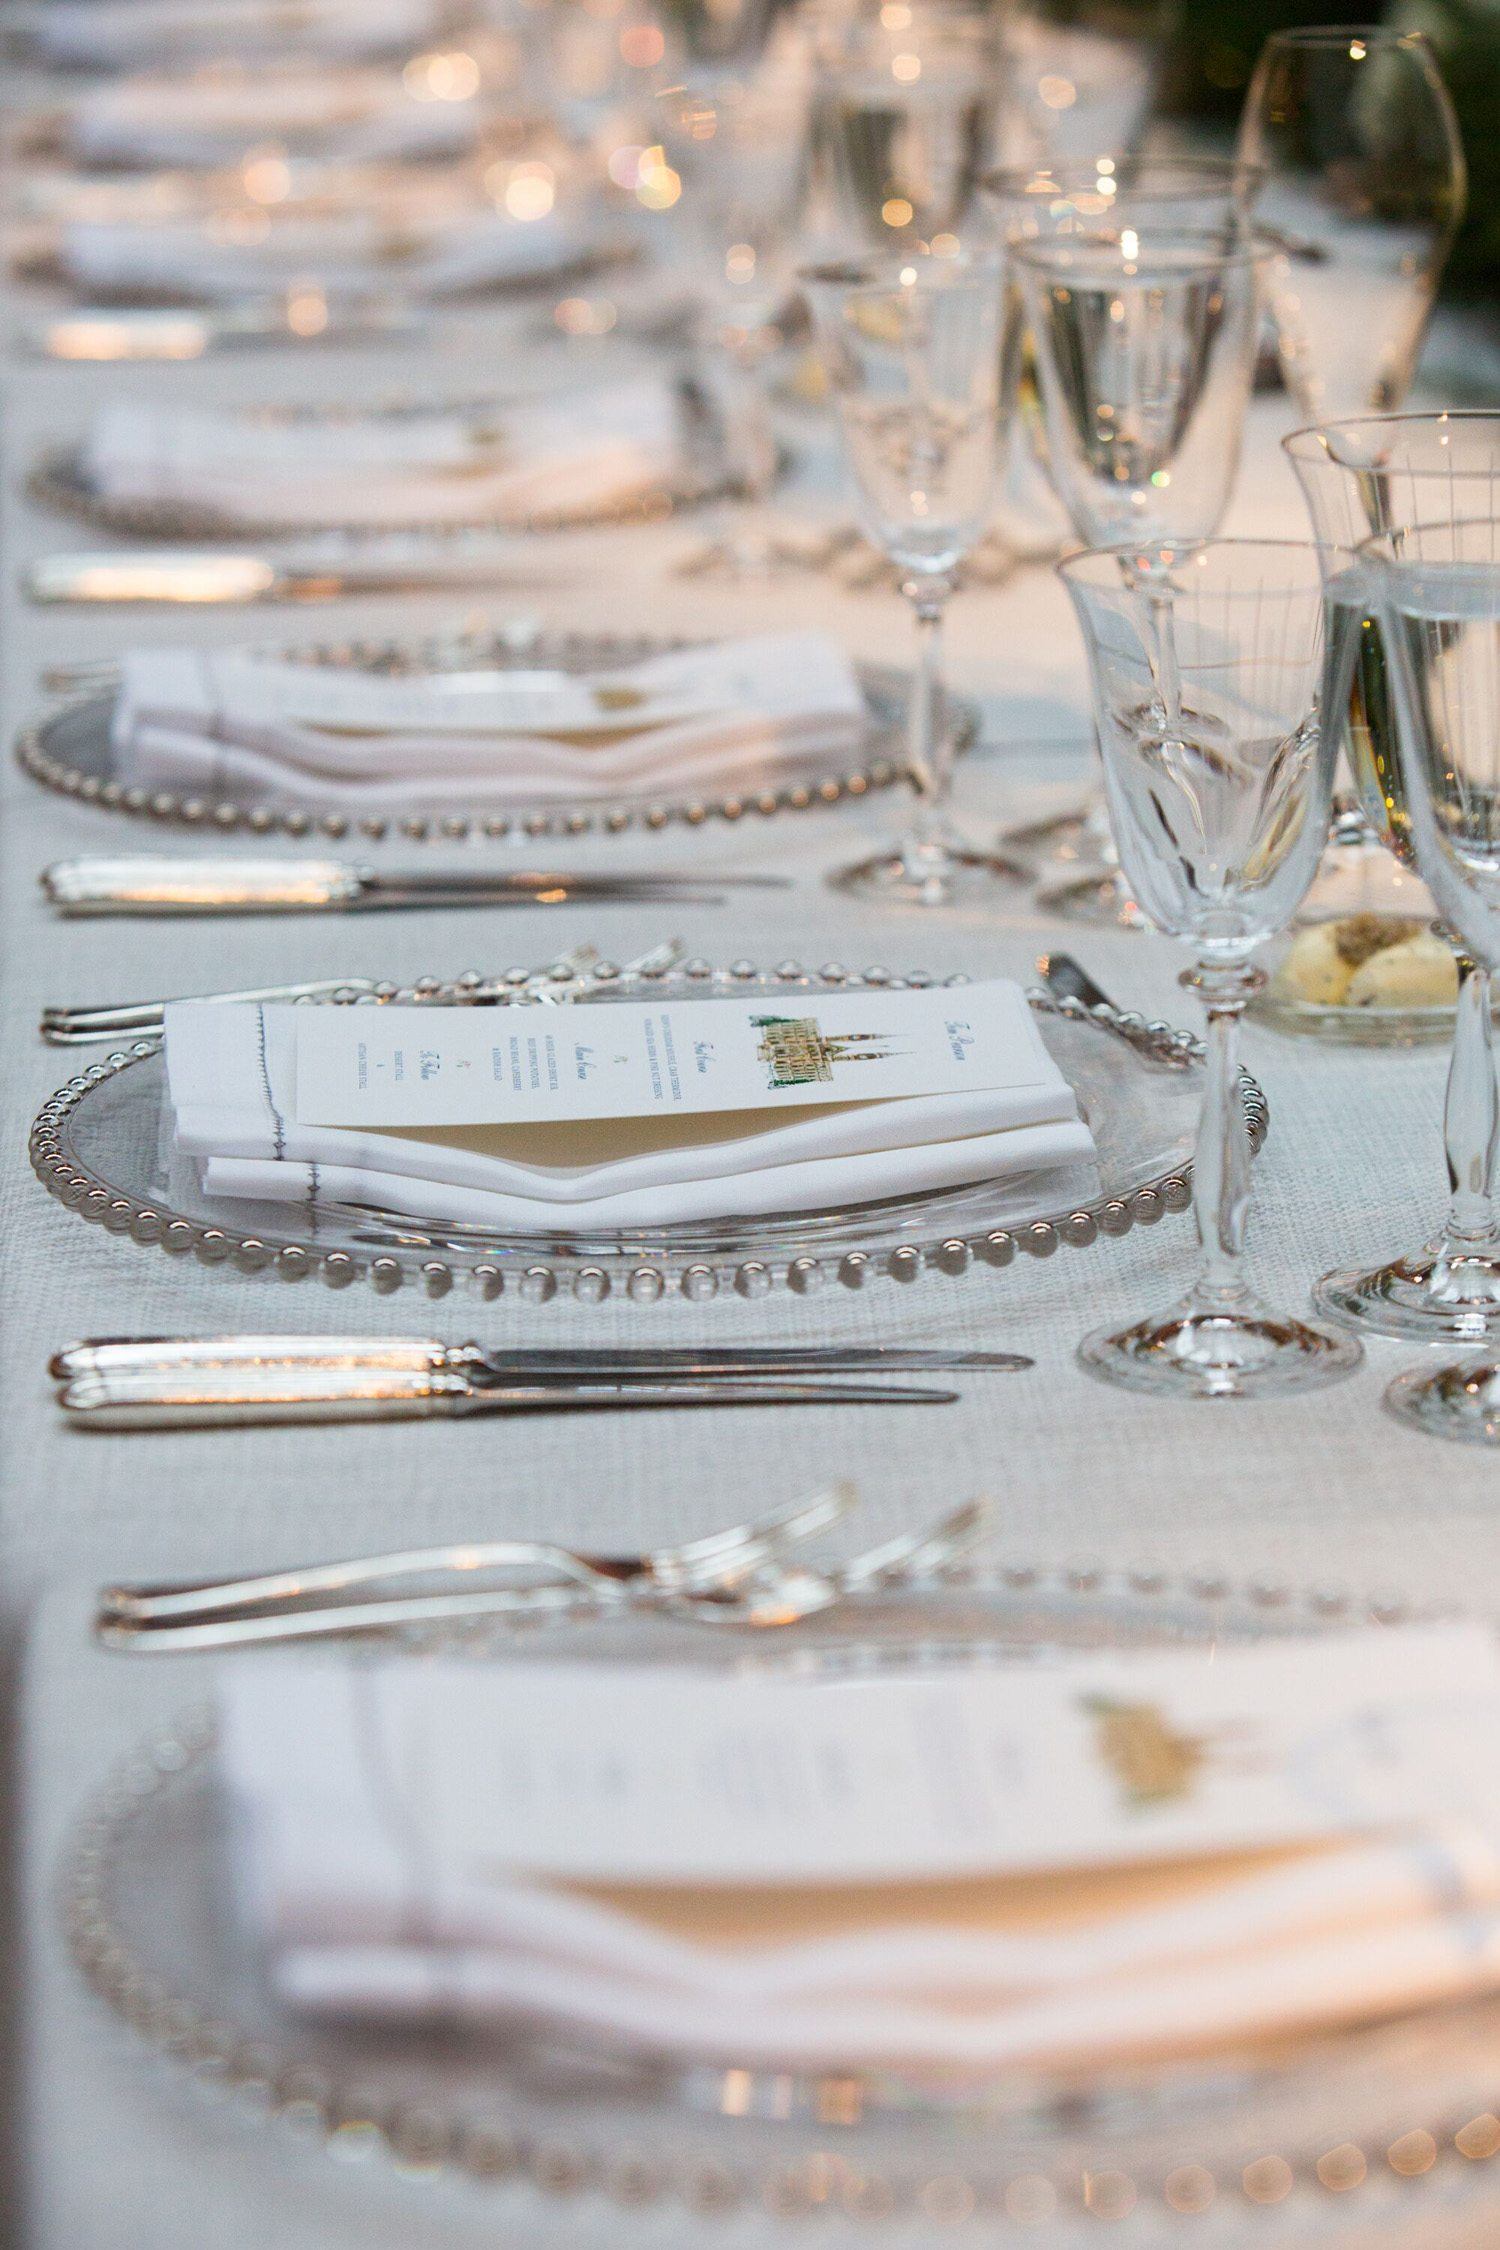 Littleton-Rose-Natural-History-Museum-London-Wedding-Planners-Table-Set-Up.jpg